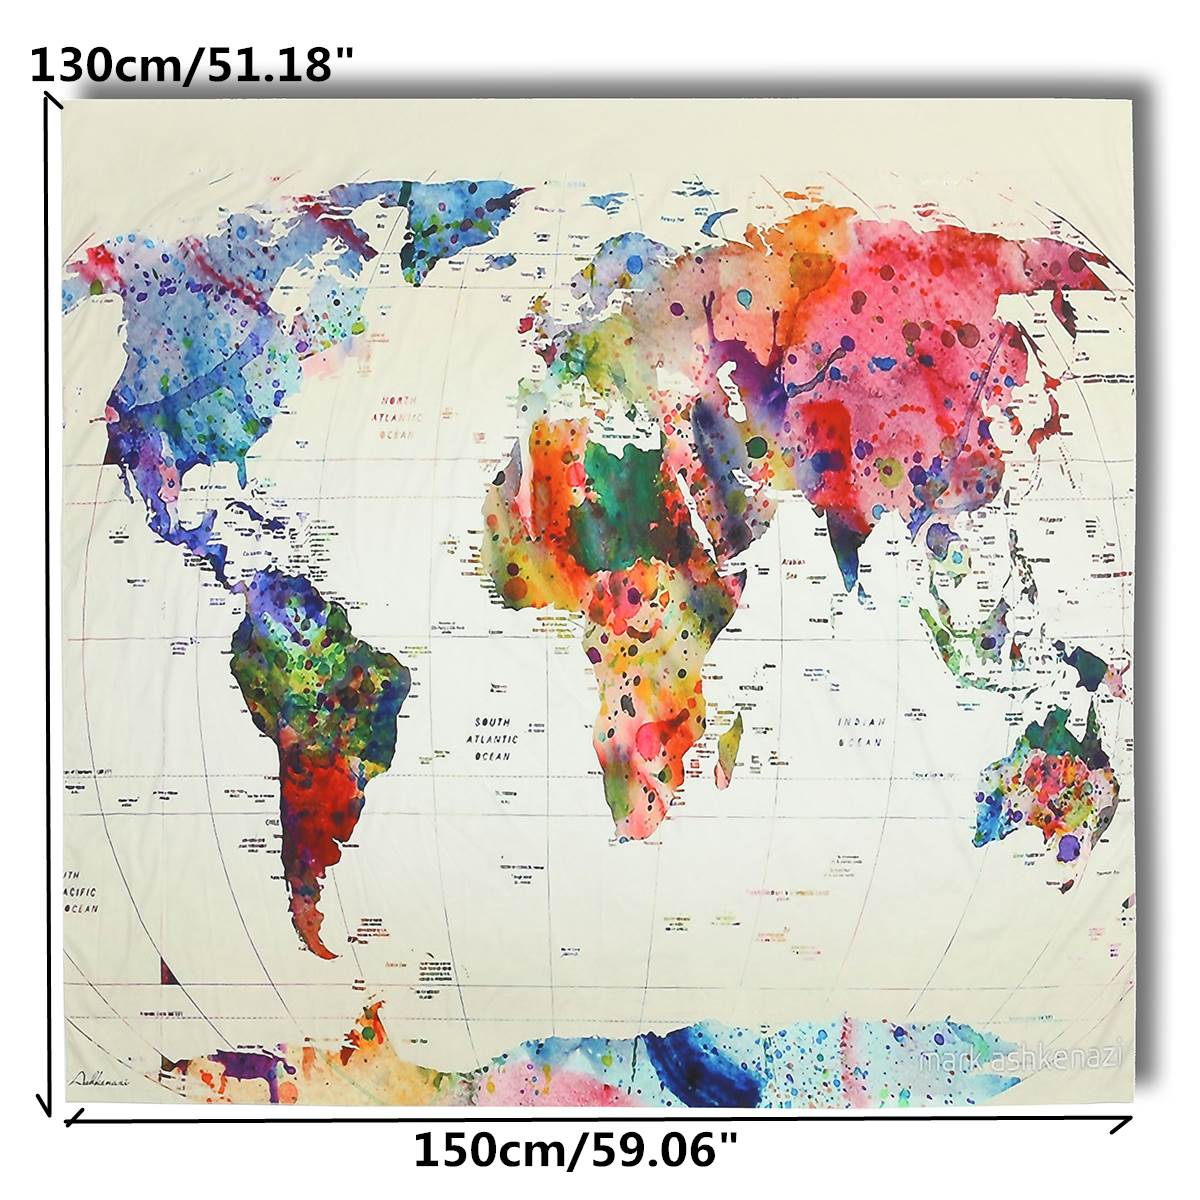 World map wall hanging tapestry indio mandala throw blanket colcha world map wall hanging tapestry indio mandala throw blanket colcha de polister hogar del dormitorio sala de estar decoracin 150x130 cm en tapices de hogar gumiabroncs Choice Image